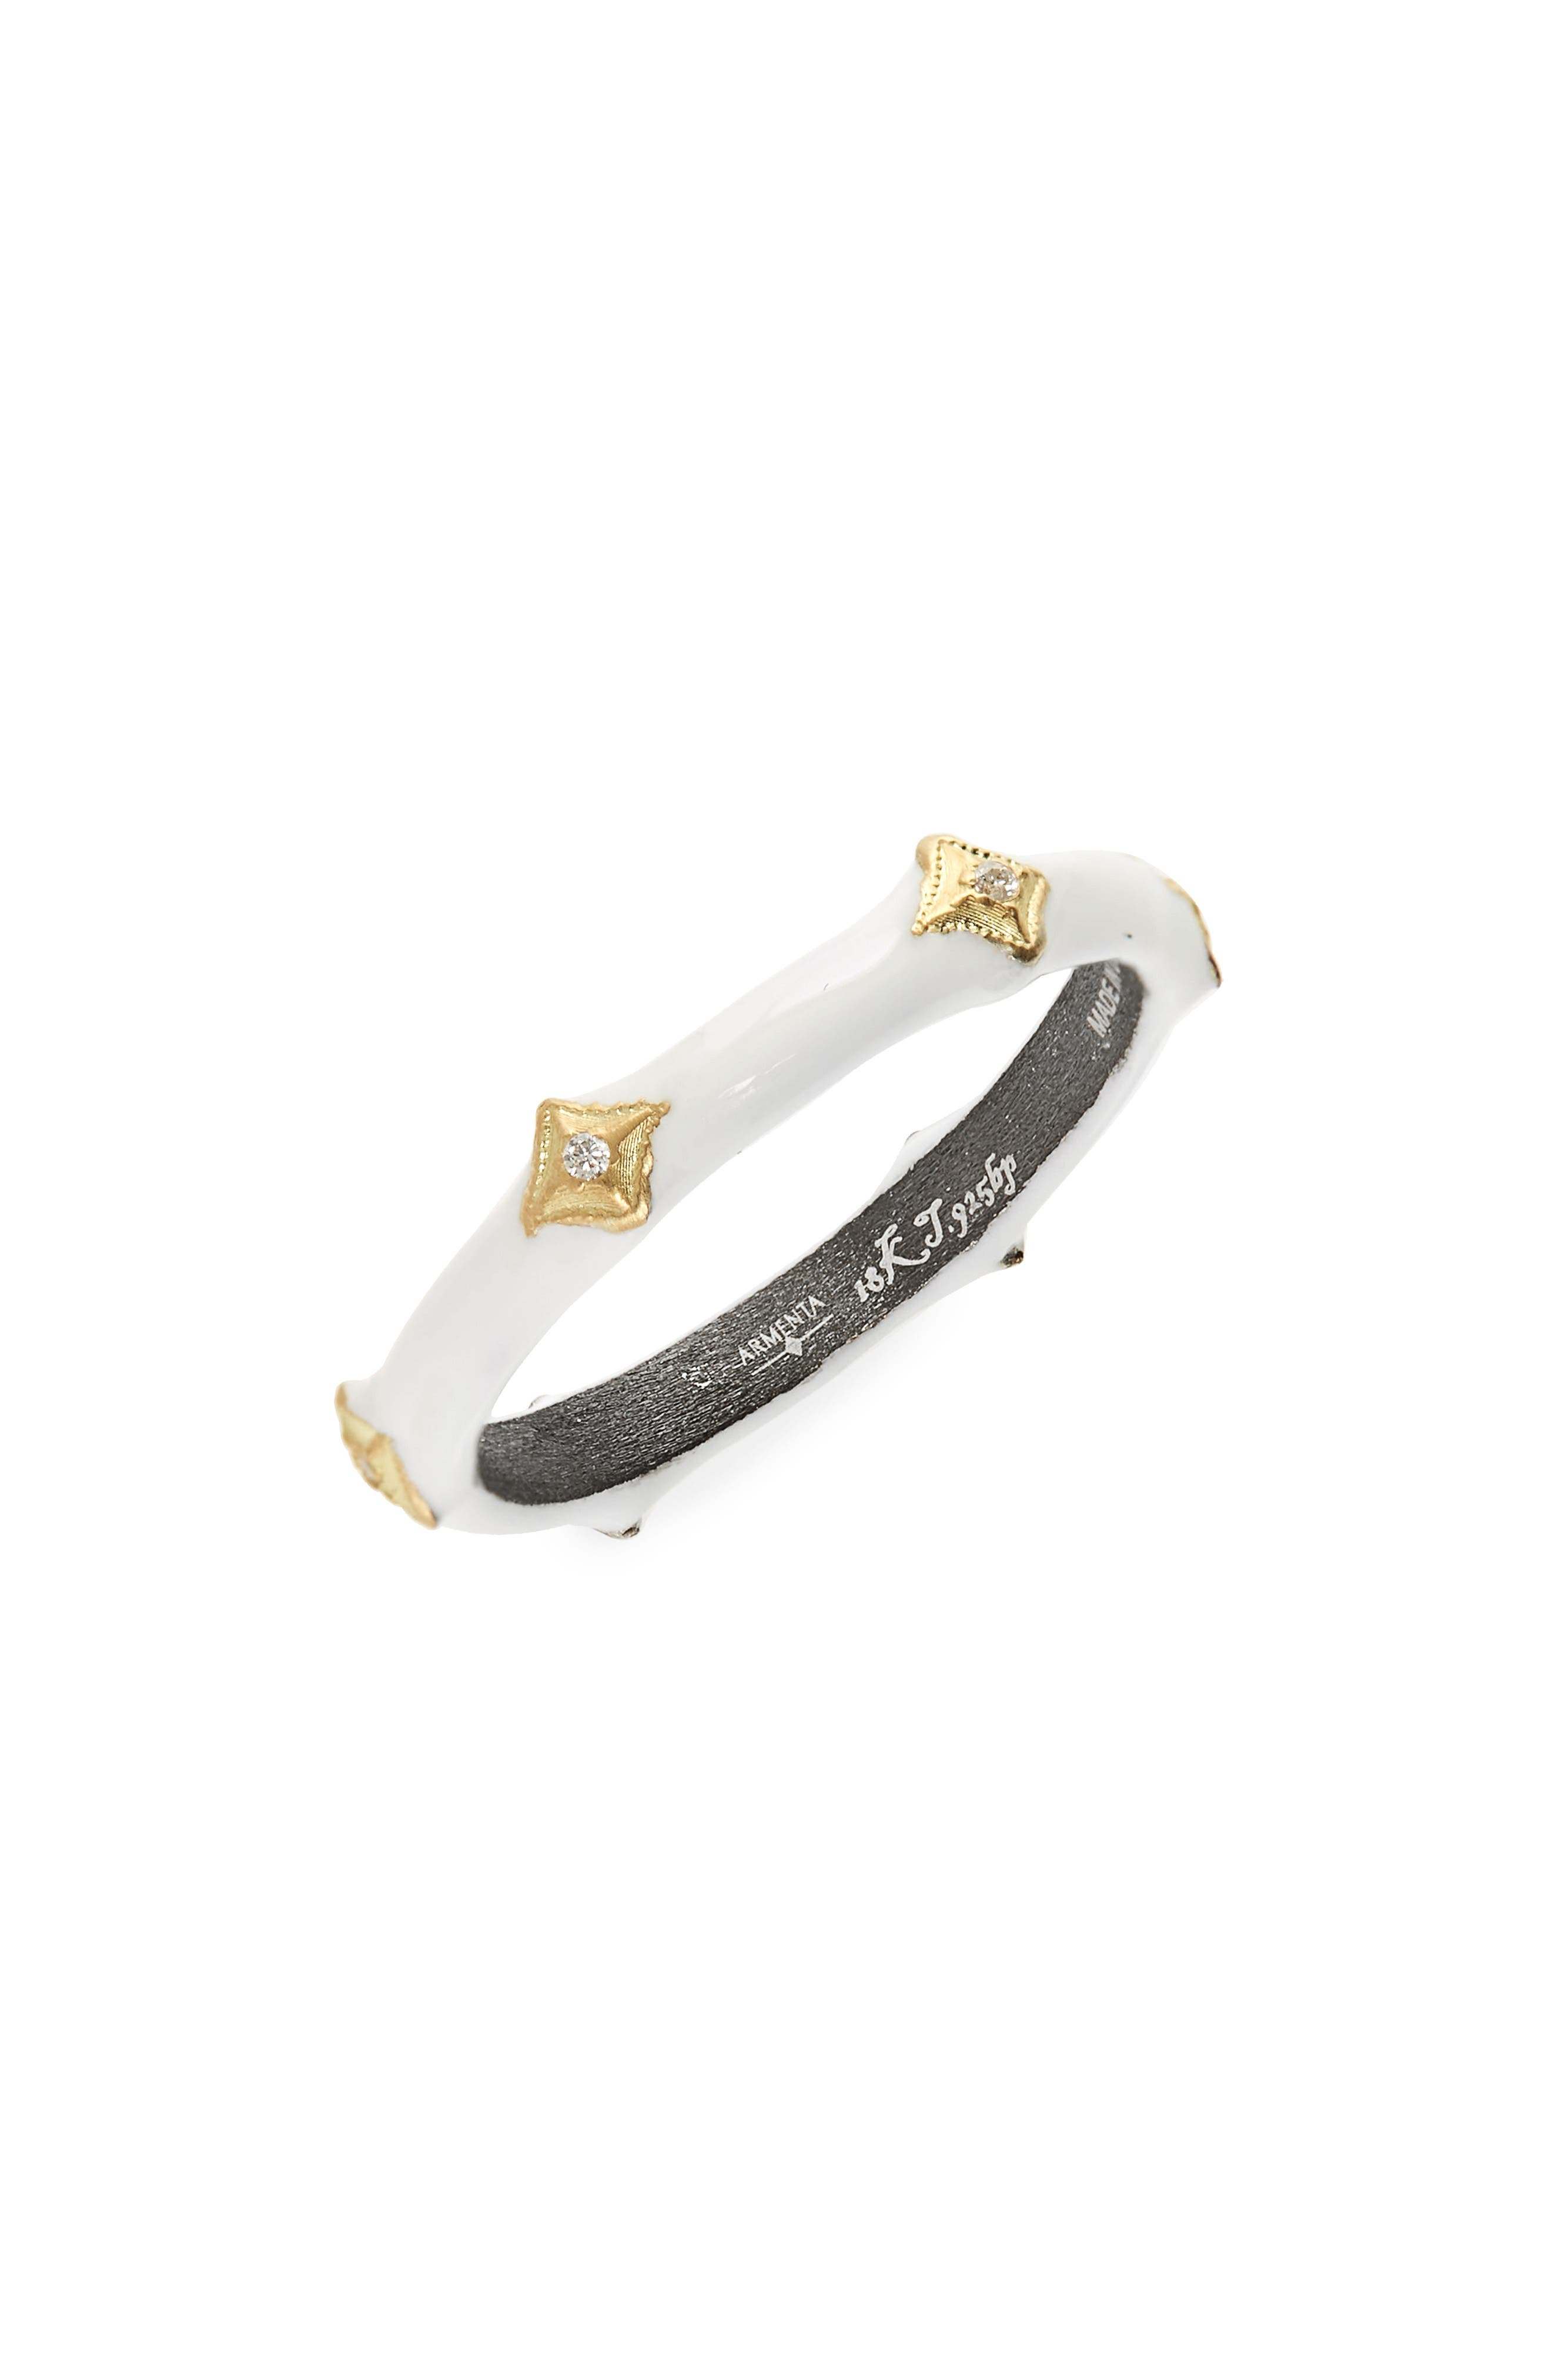 Old World Enamel Crivelli Ring,                             Main thumbnail 1, color,                             Blackened Silver/ Gold